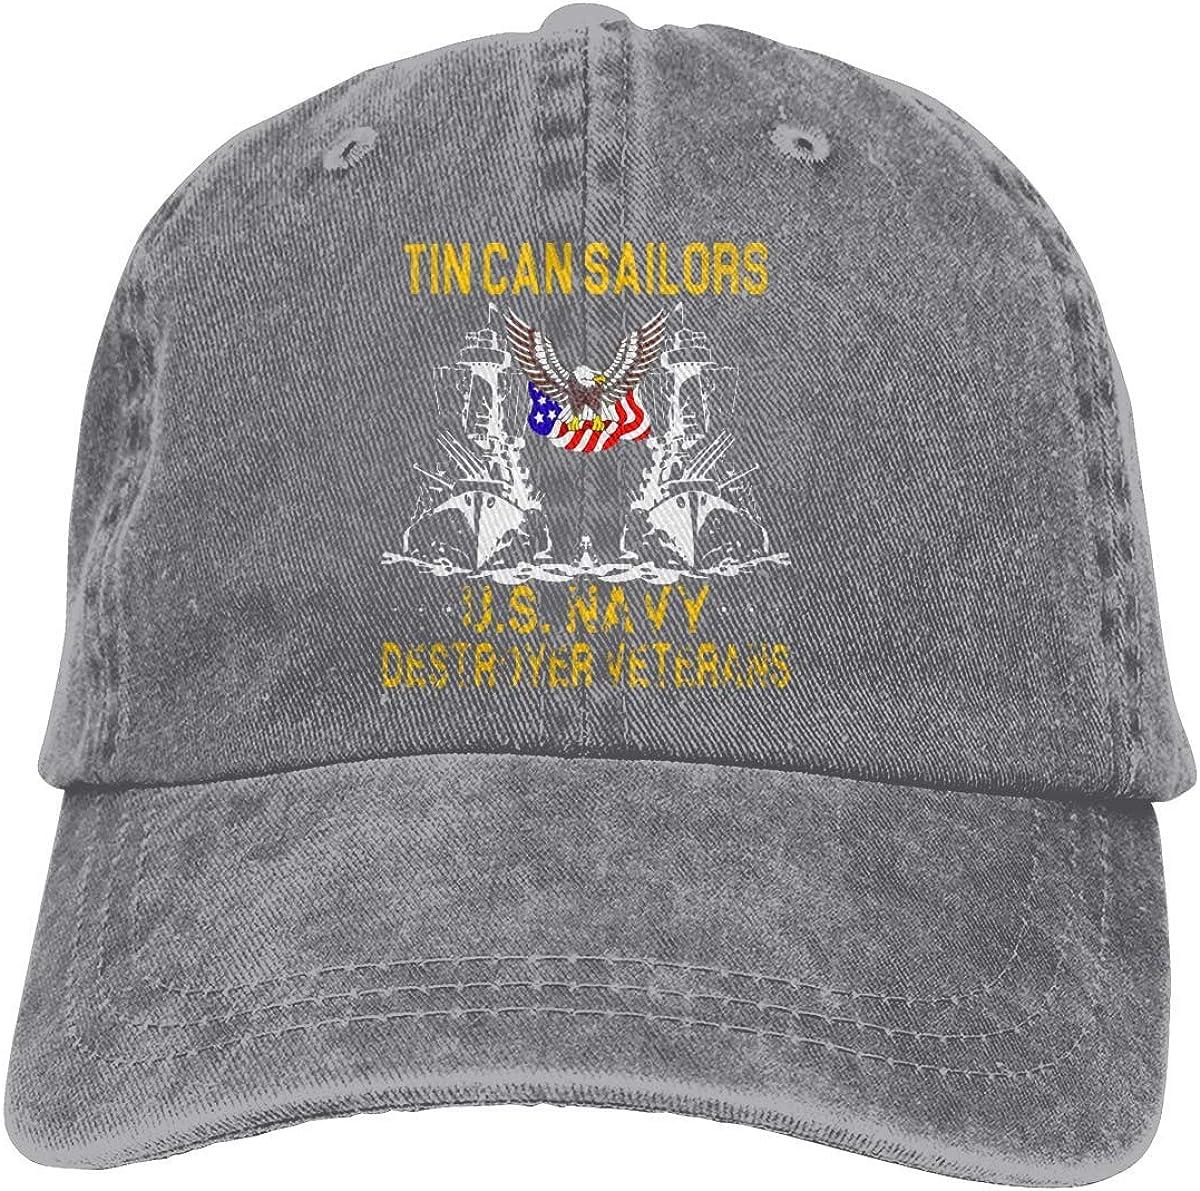 Tin Can Sailors Us Navy Destroyer Veterans Adjustable Vintage Washed Denim Cotton Dad Hat Baseball Caps Outdoor Sun Hat